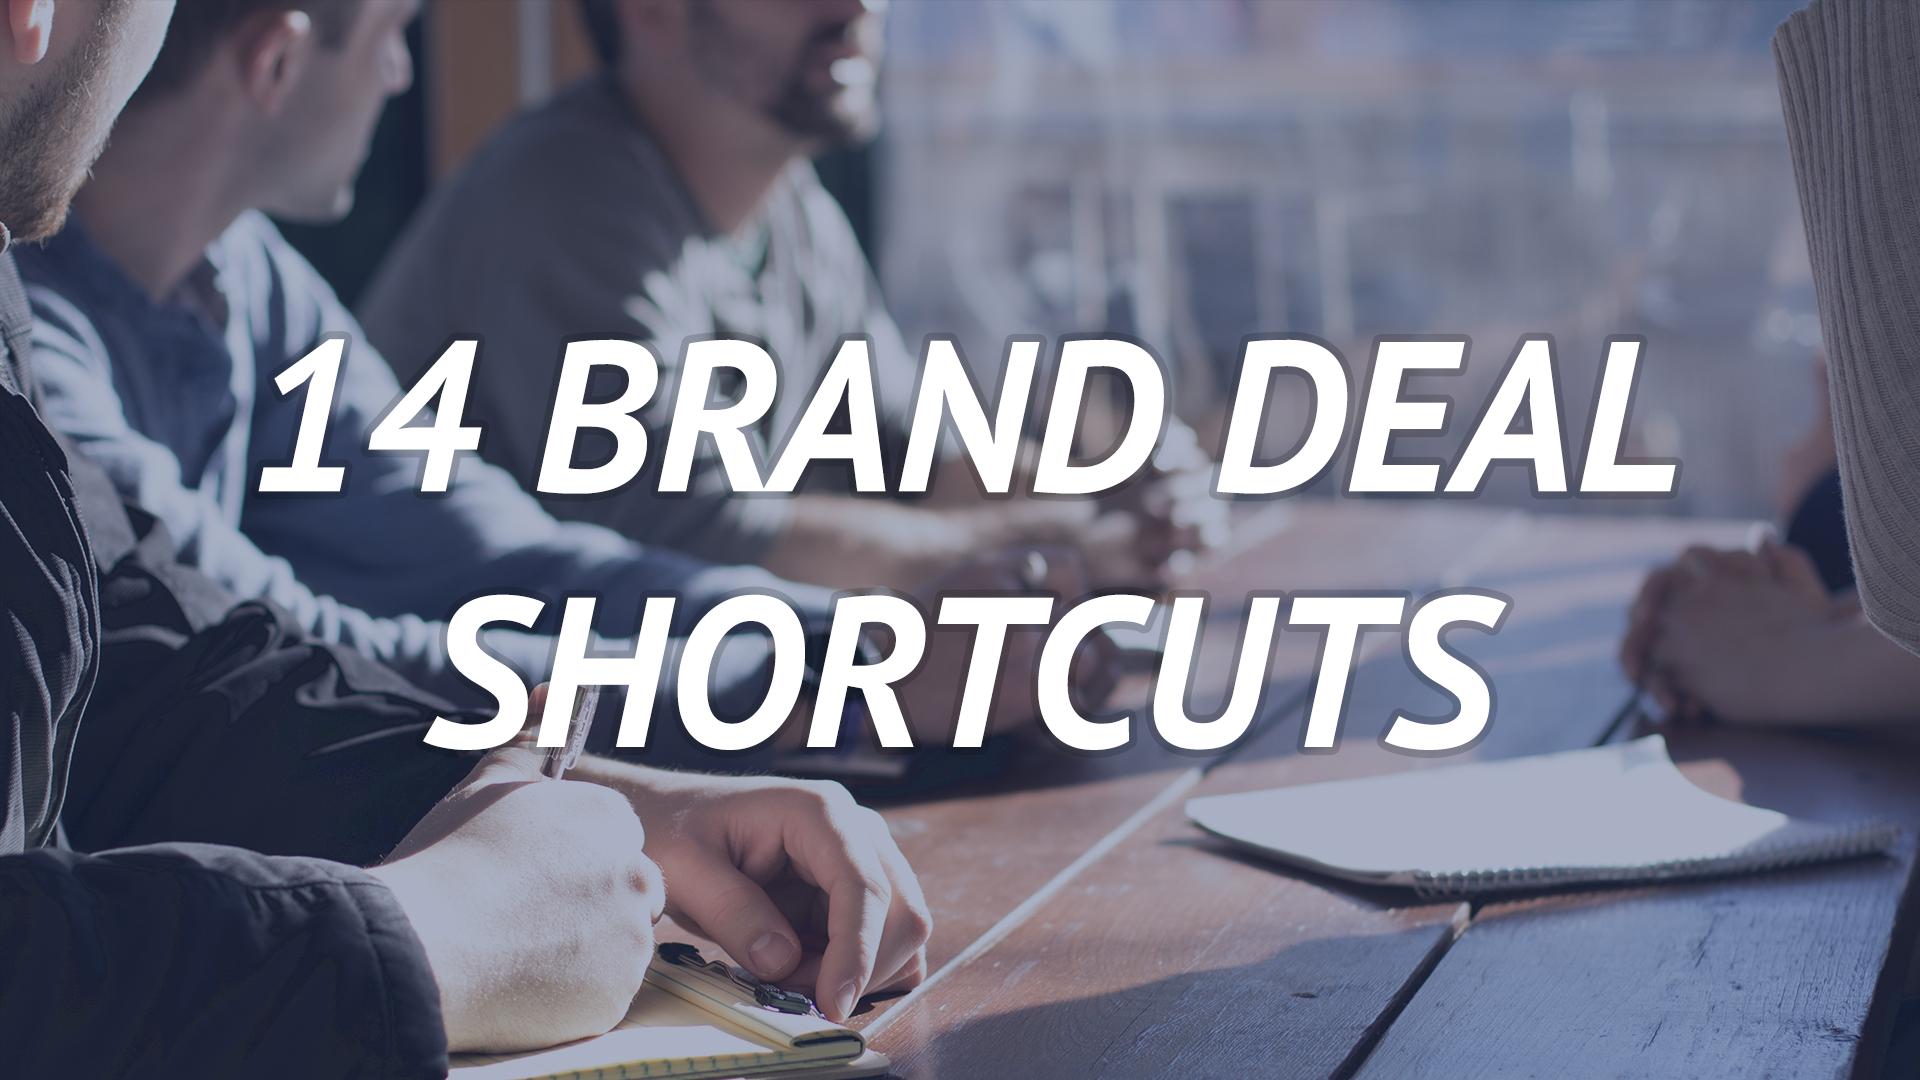 14 brand deal shortcuts